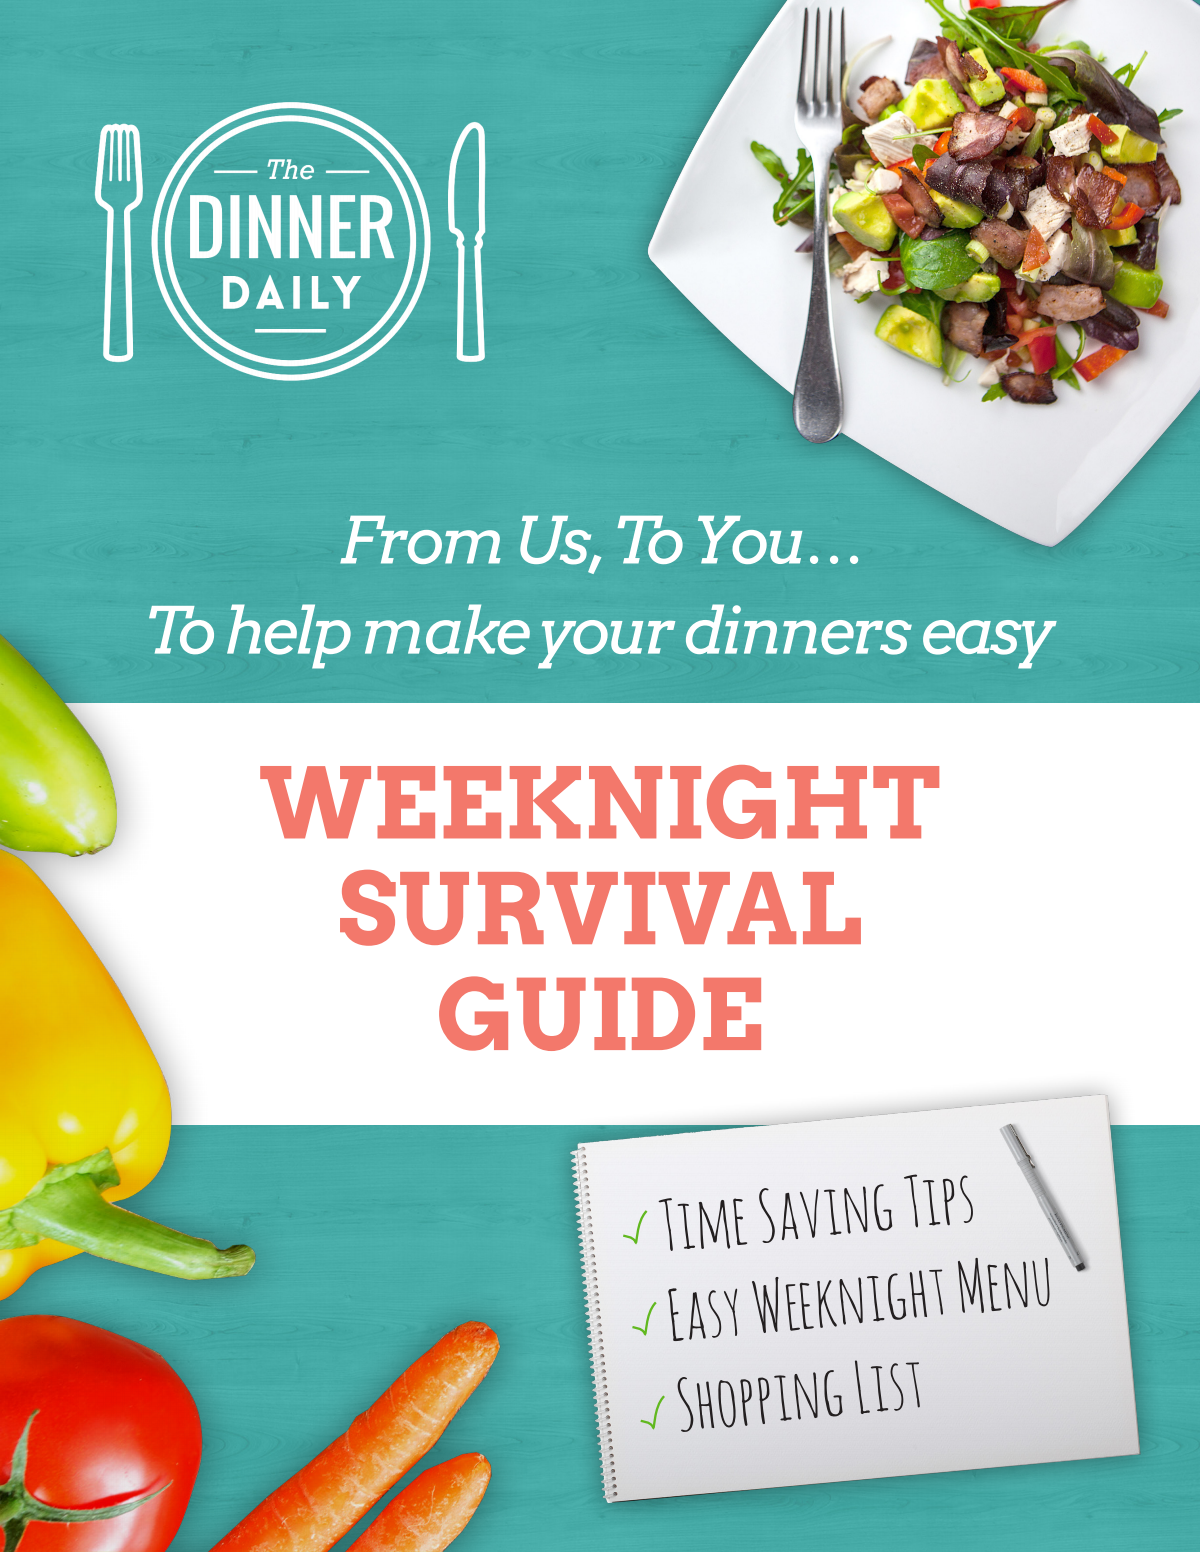 Weeknight Survival Guide